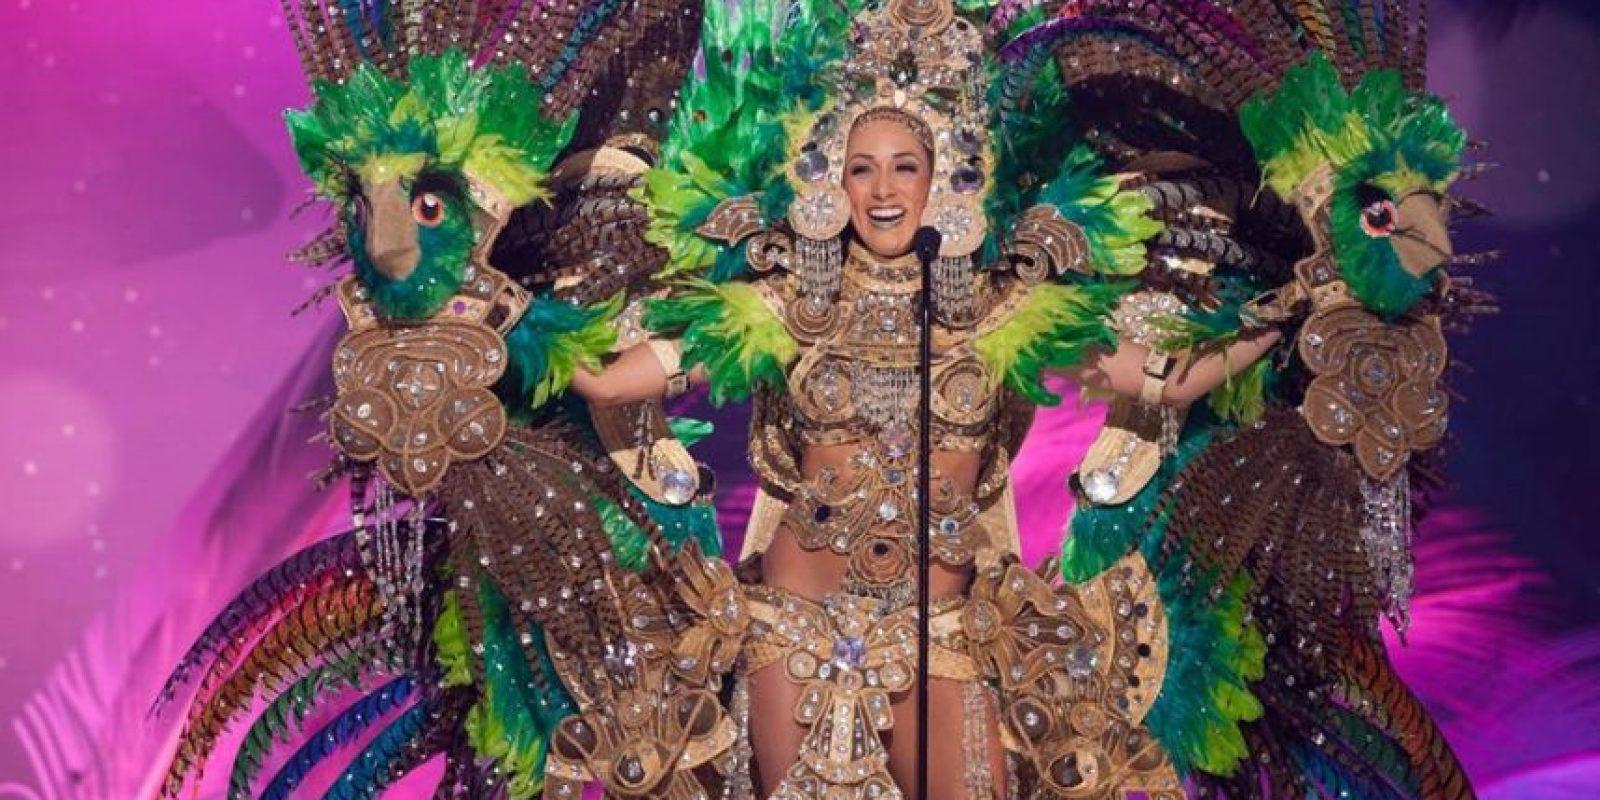 ¿Un ave, un guerrero, qué eres Marline Barberena? Foto:Facebook/Miss Nicaragua